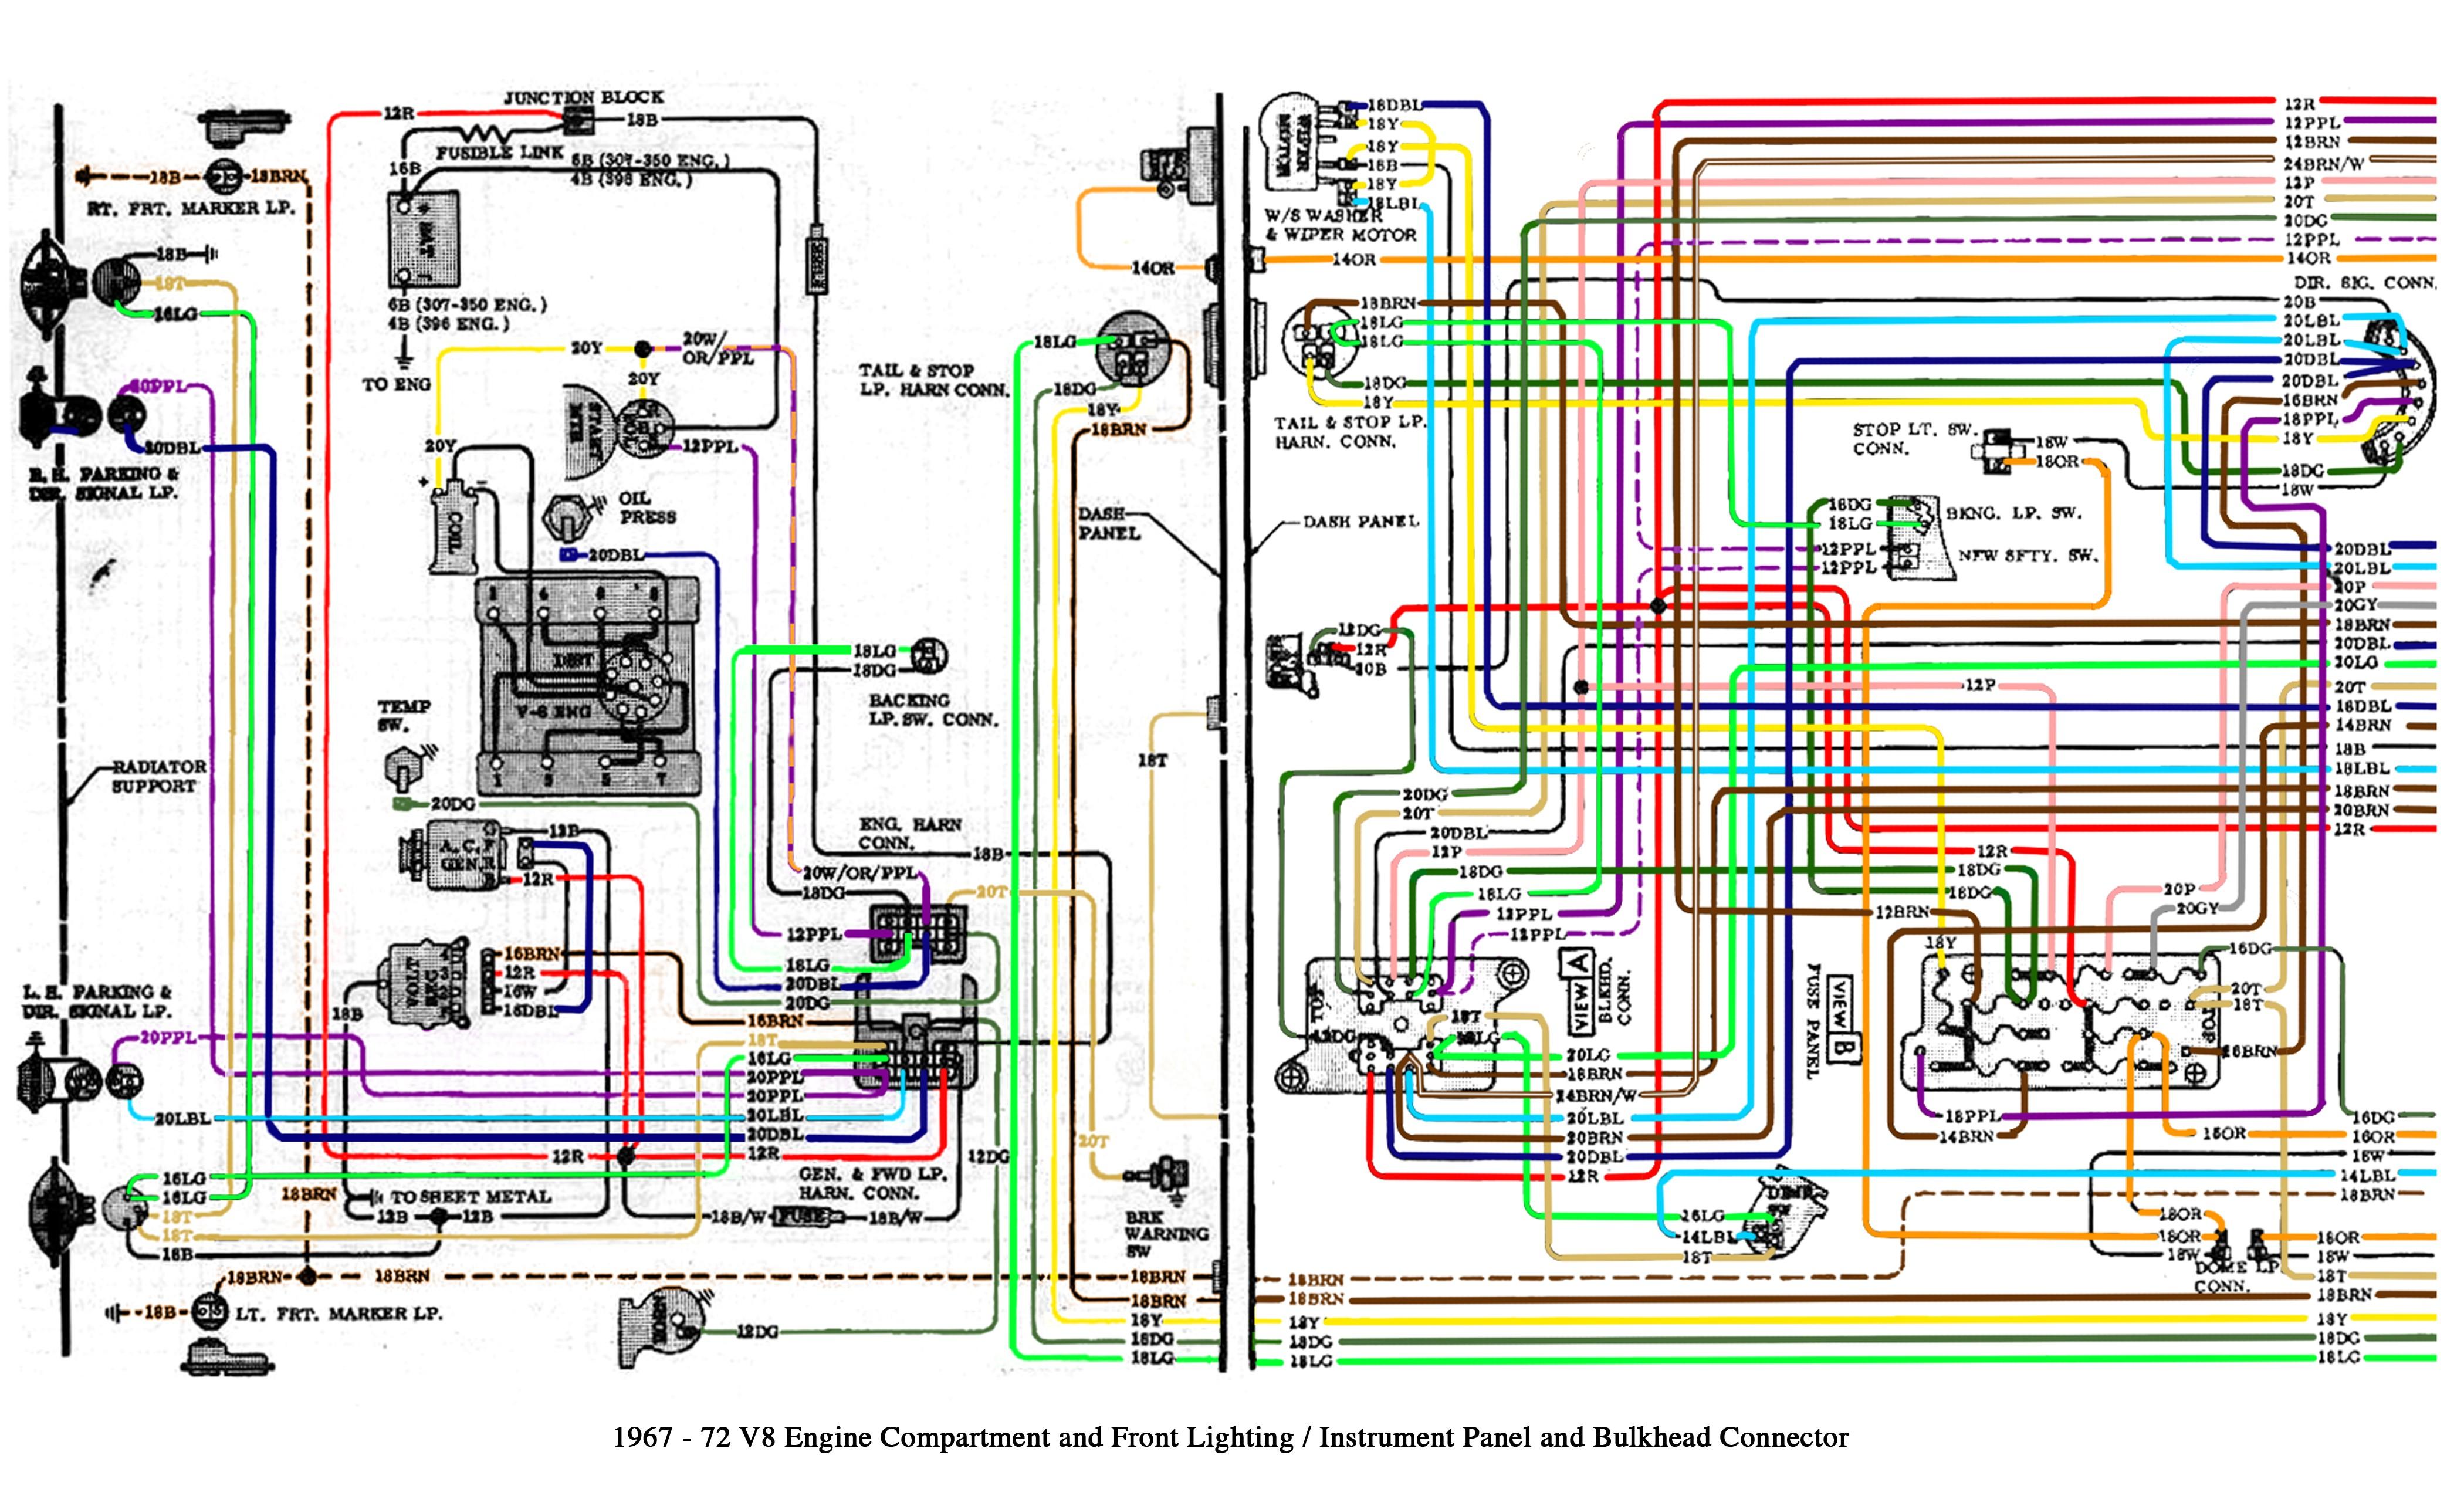 1979 Chevy Truck Radio Wiring Diagram 1971 Chevy Truck Wiring Harness Wiring Diagram Paper Of 1979 Chevy Truck Radio Wiring Diagram